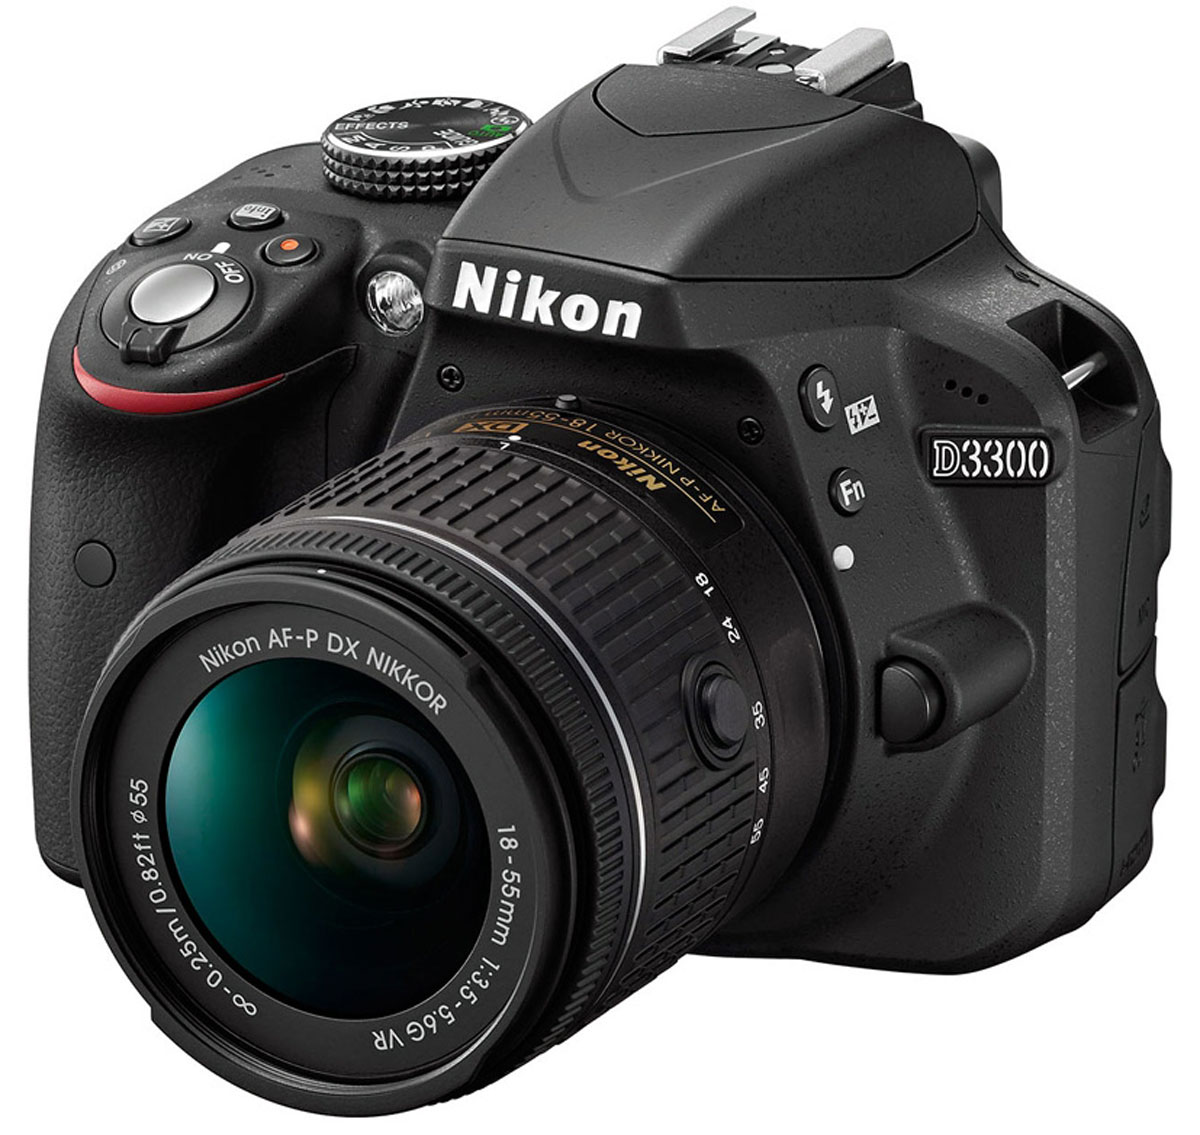 Nikon D3300 Kit 18-55 AF-P VR, Black цифровая зеркальная камера nikon d5300 kit 18 55 vr black цифровая зеркальная камера